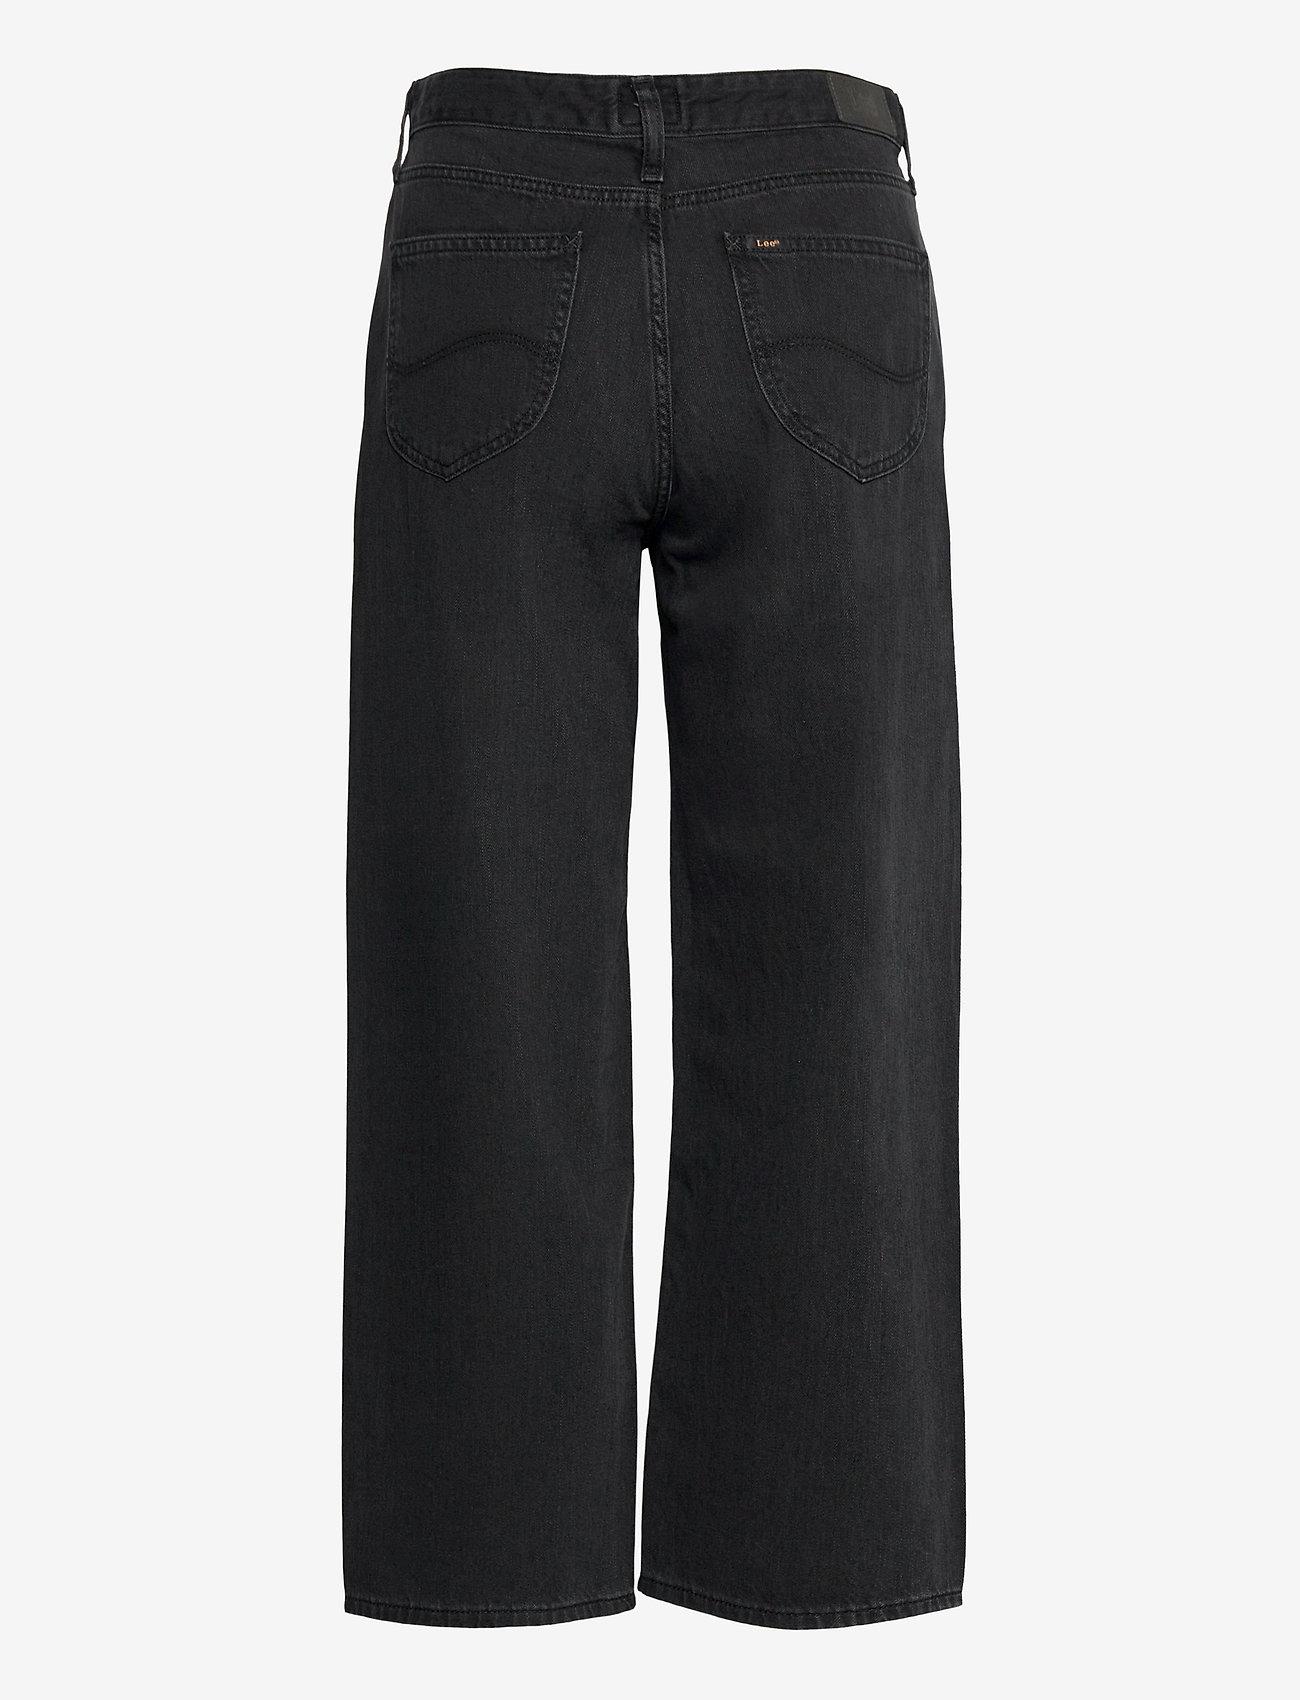 Lee Jeans - WIDE LEG - brede jeans - black duns - 1